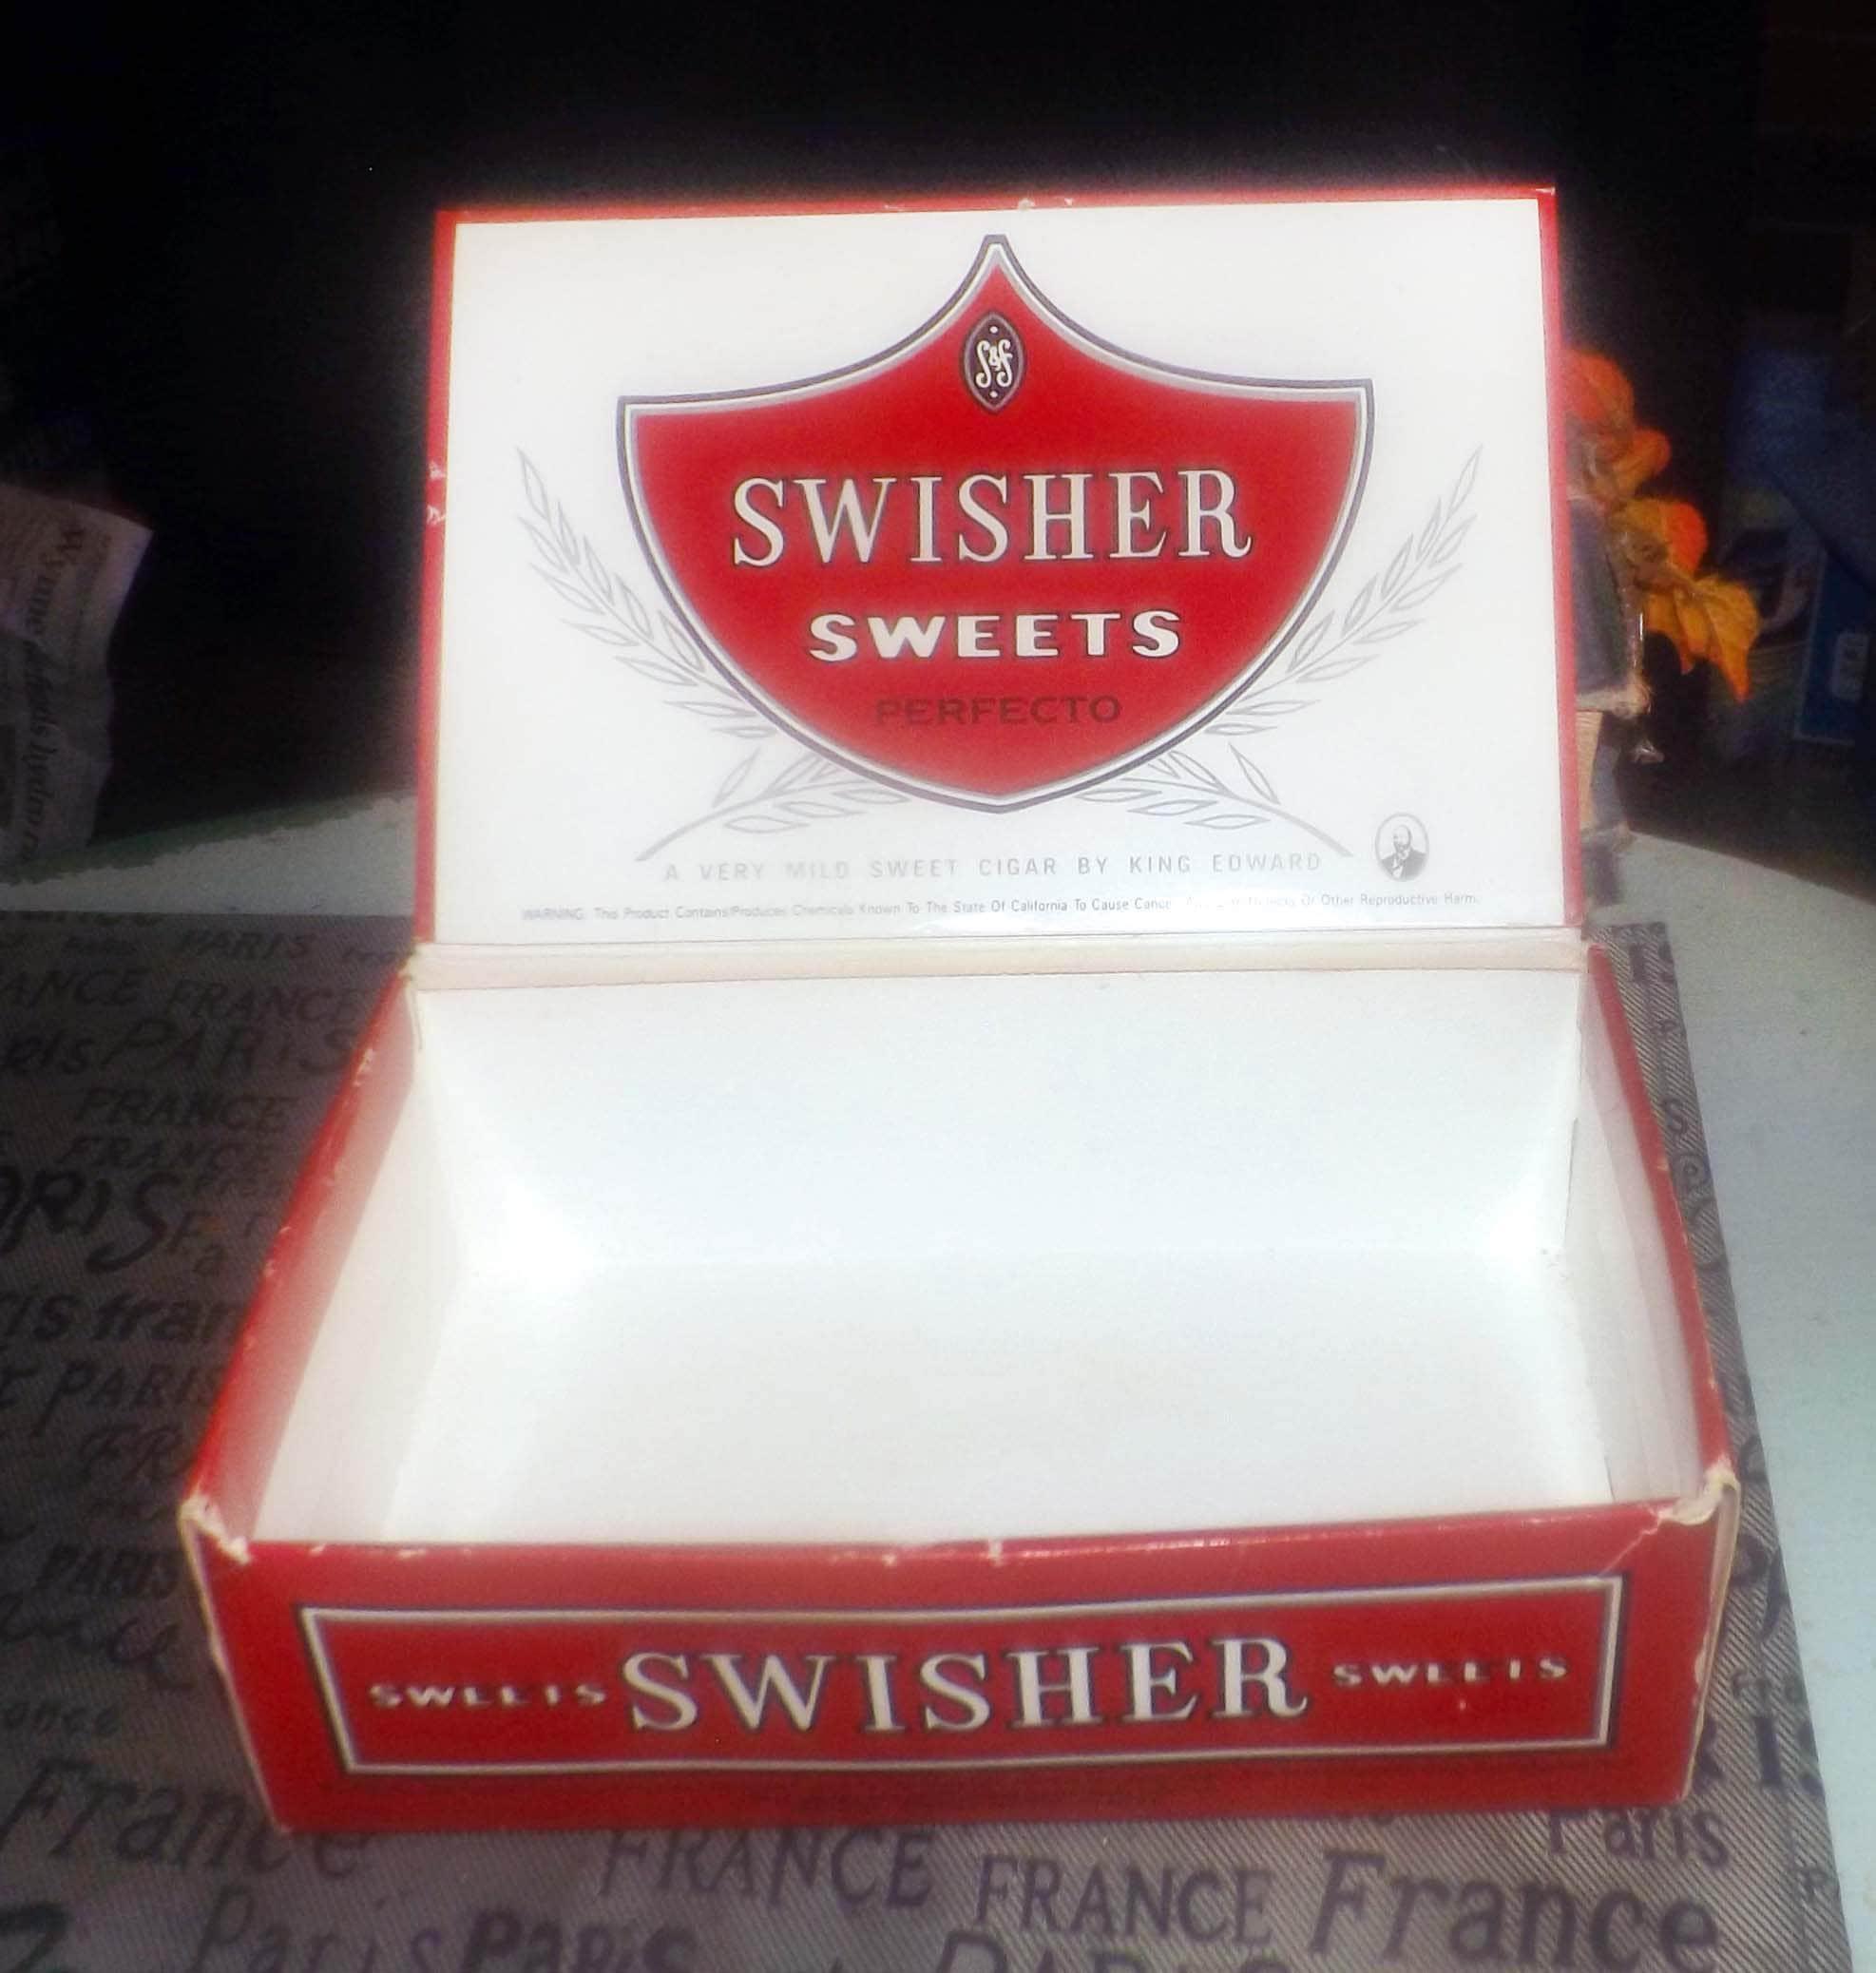 Vintage (mid 1970s) cigar box for King Edward Perfecto